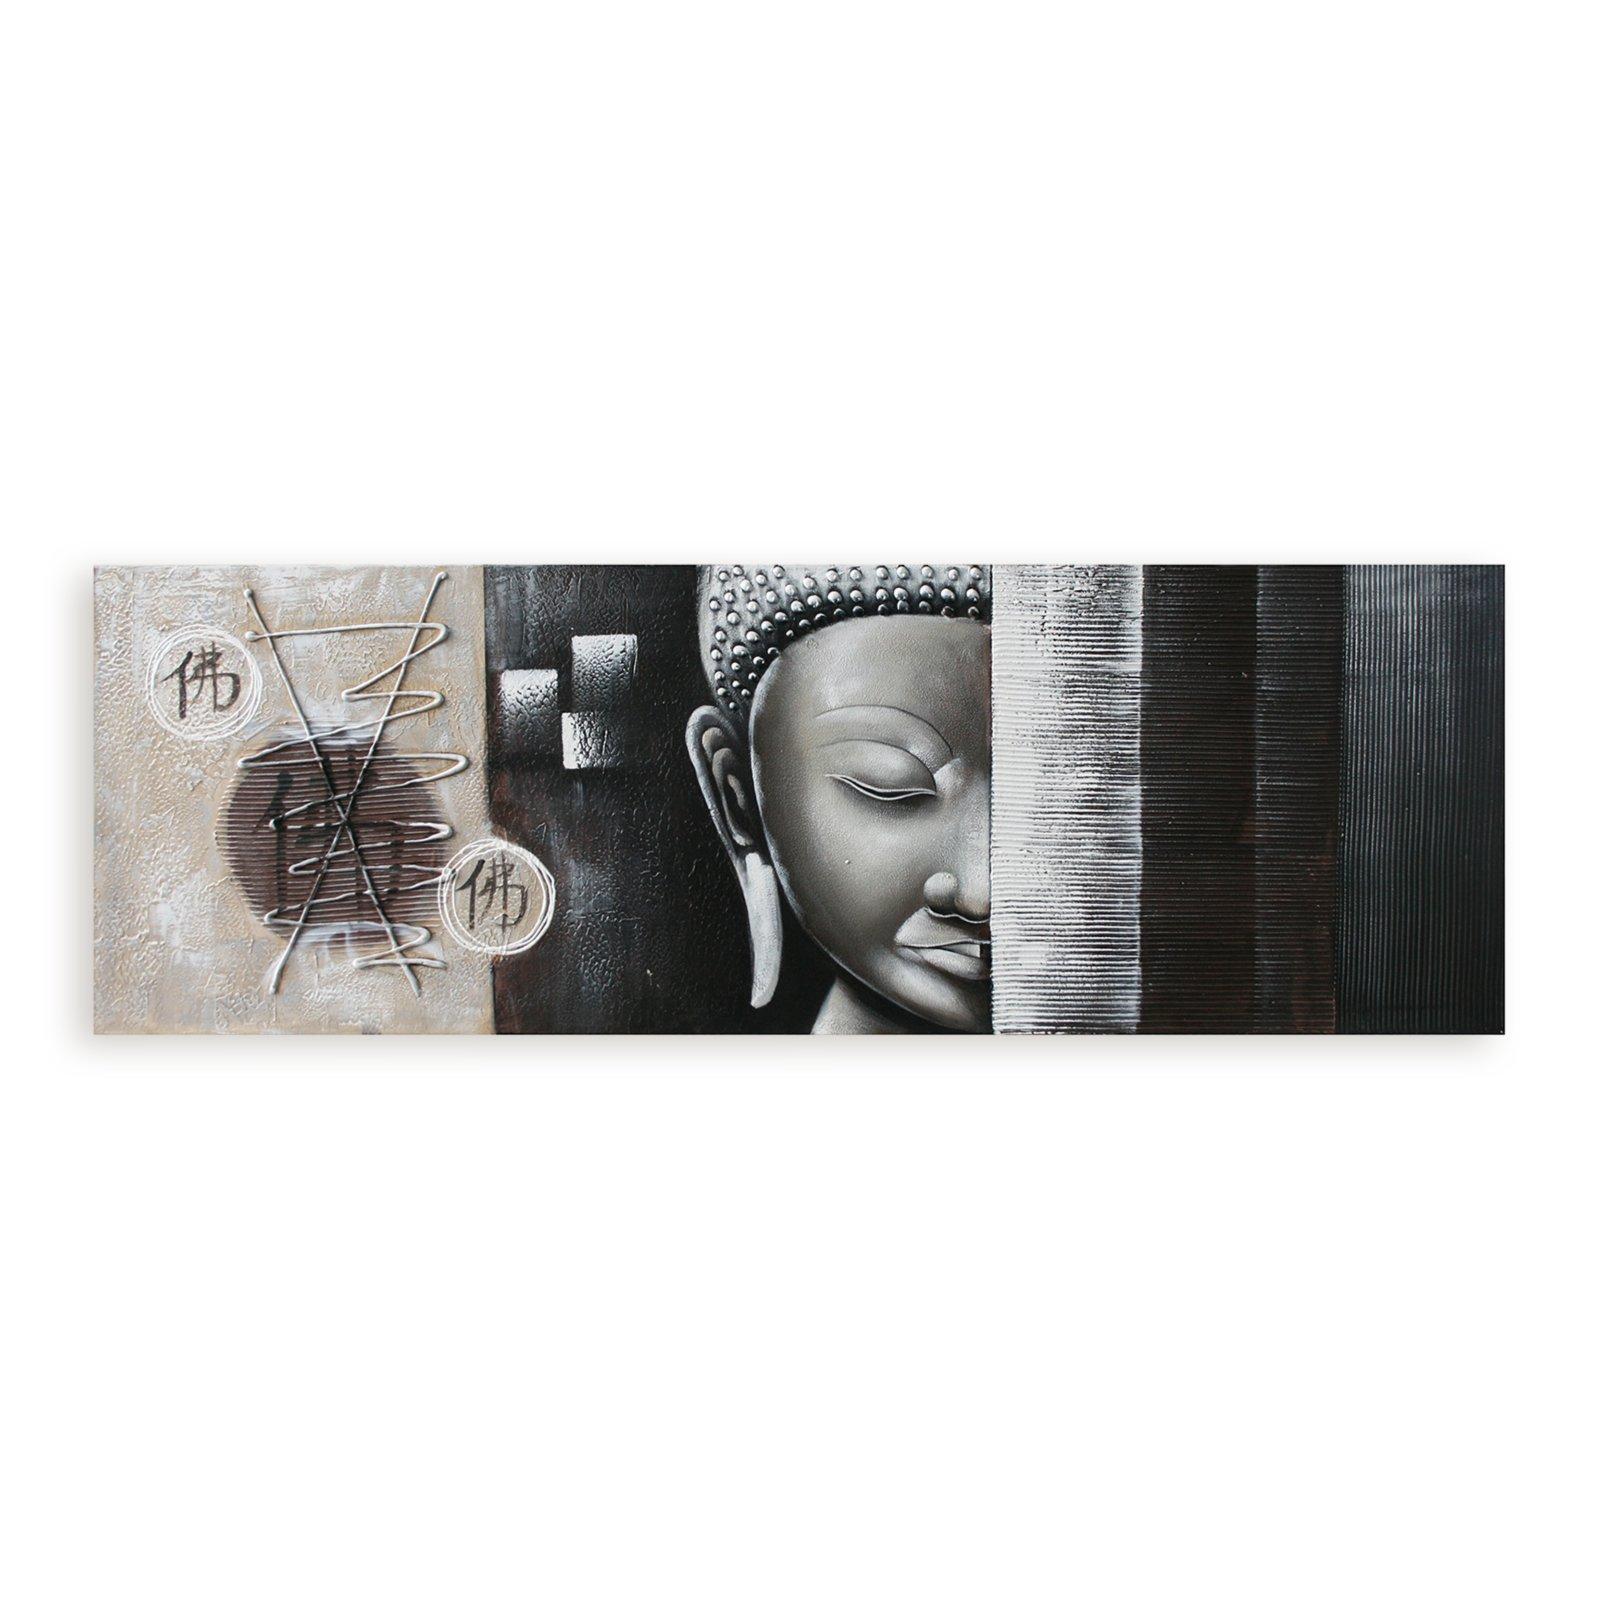 lgem lde buddha handgefertigt 50x150 cm bilder. Black Bedroom Furniture Sets. Home Design Ideas